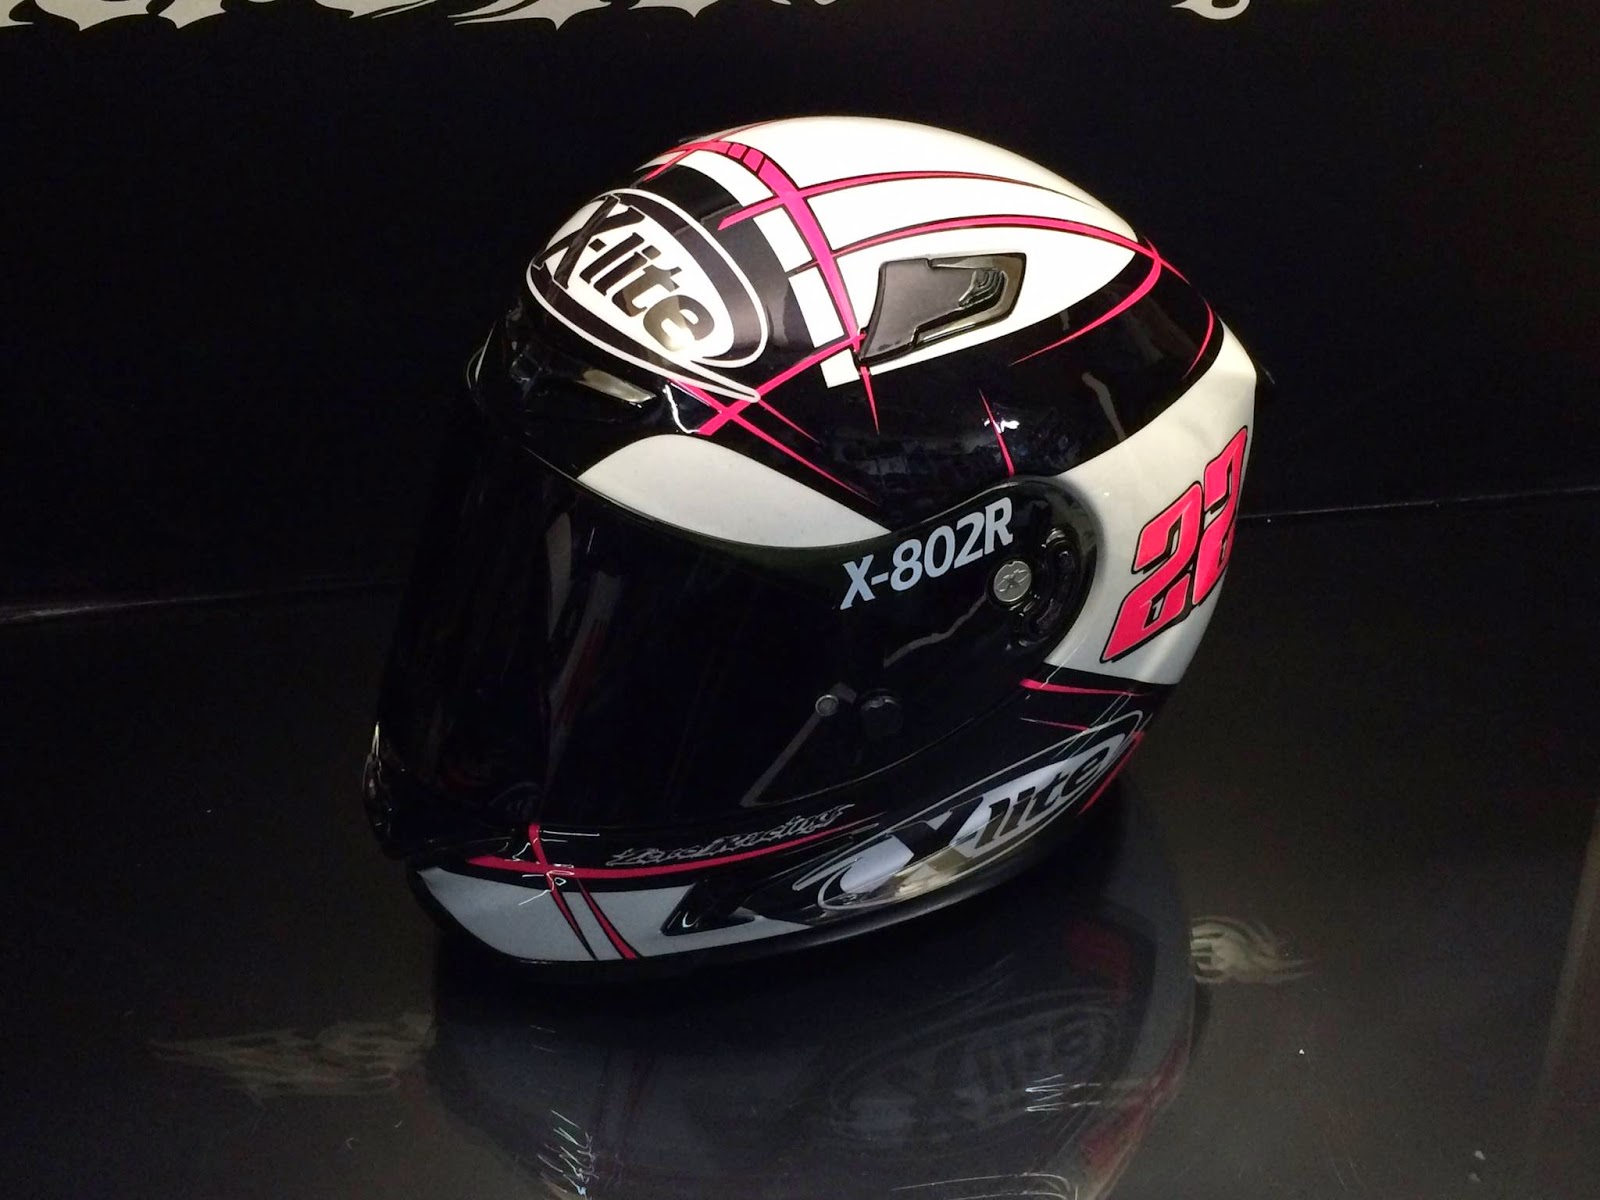 racing helmets garage x lite x 802r a carrasco winter. Black Bedroom Furniture Sets. Home Design Ideas